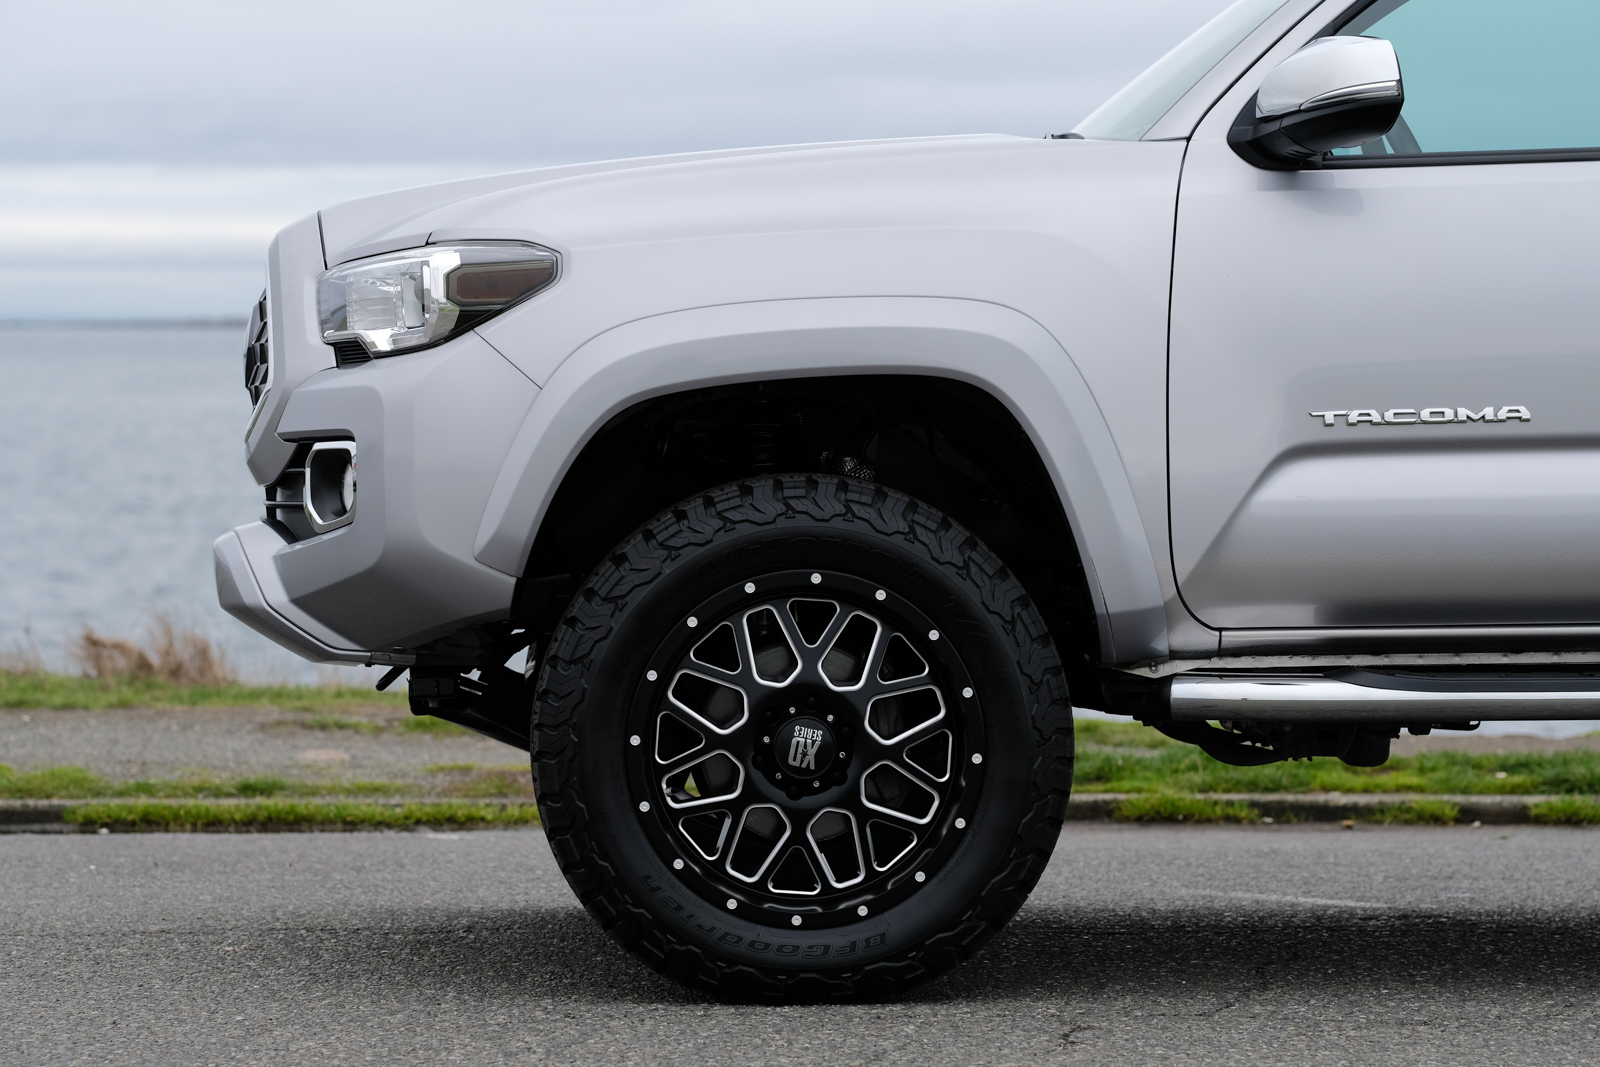 Lifted Toyota Tacoma >> 2017 Toyota Tacoma Limited Lifted - Silver Arrow Cars Ltd.